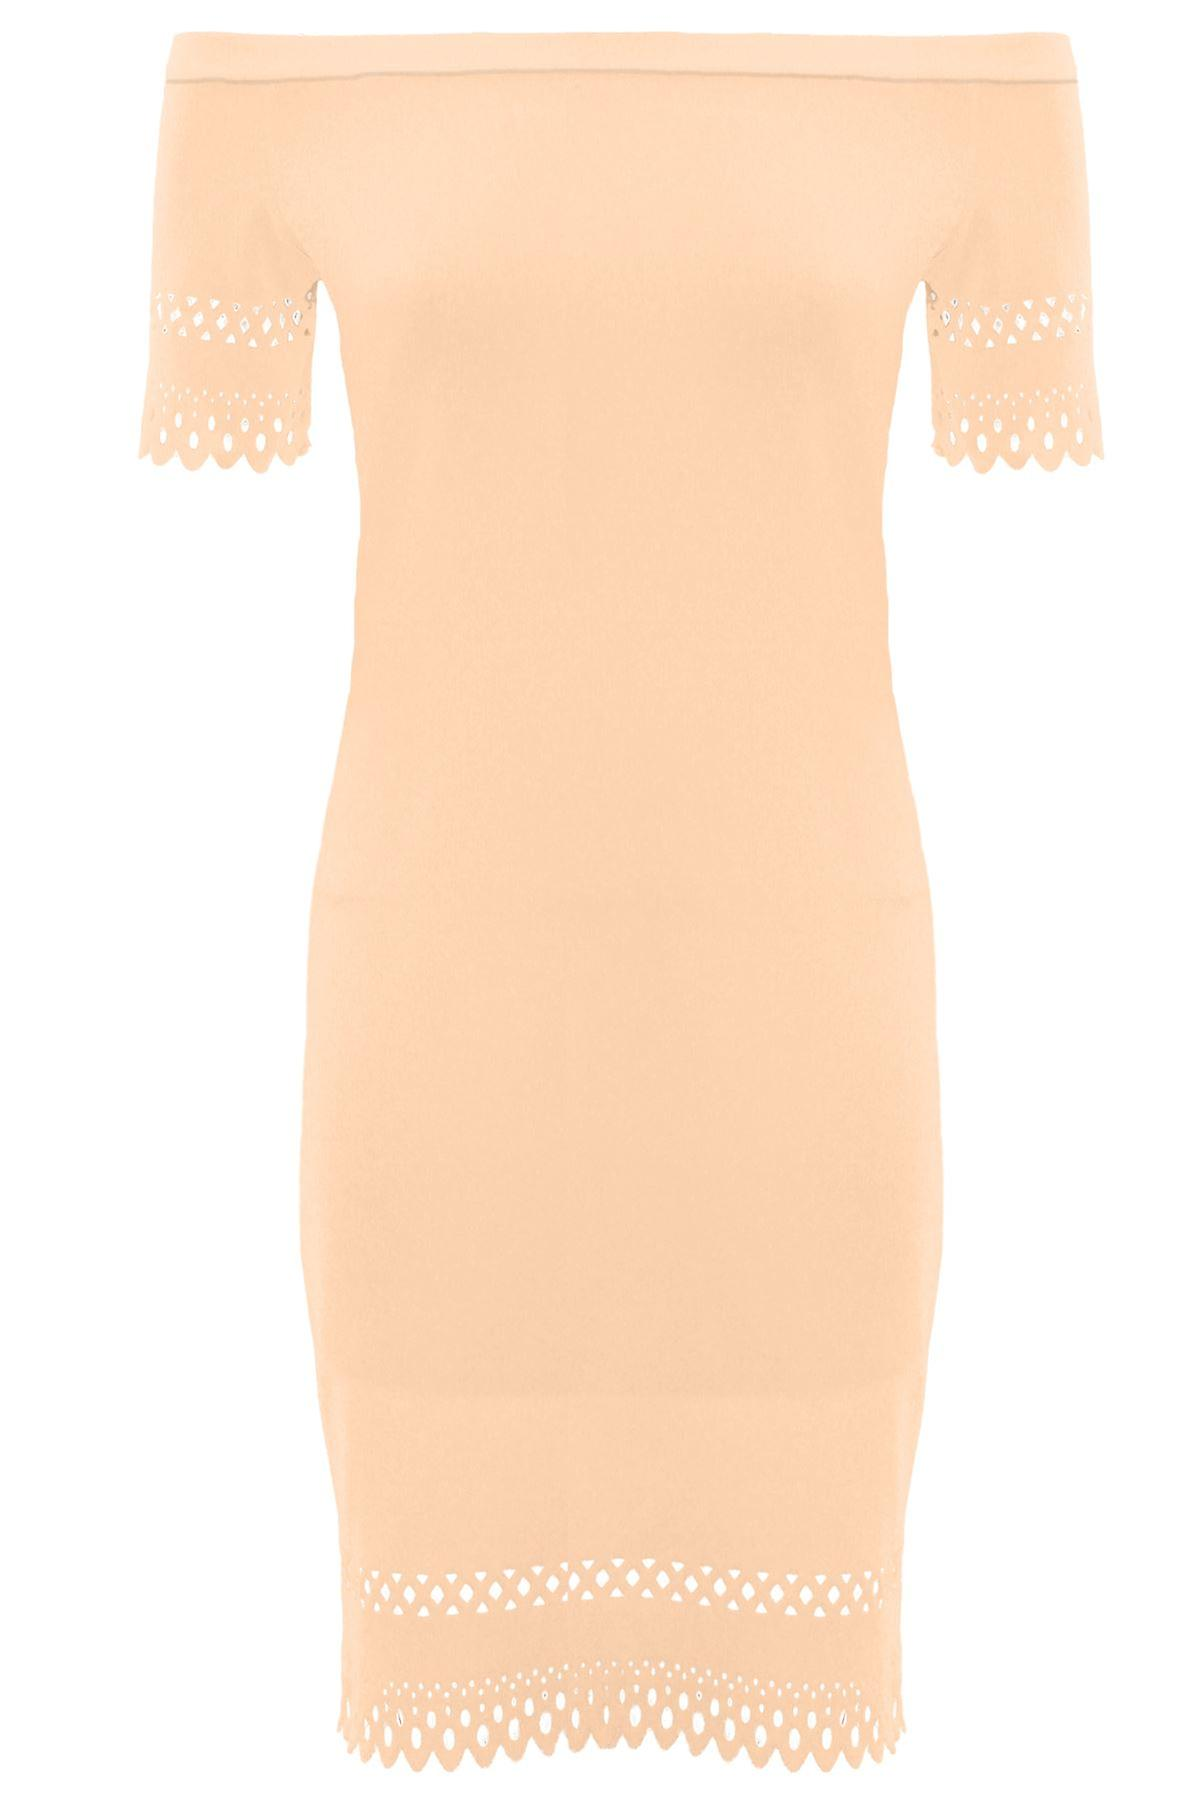 Ladies Off Shoulder Crepe Cut Out Scallop Hem Knee Length Neon Bodycon Dress